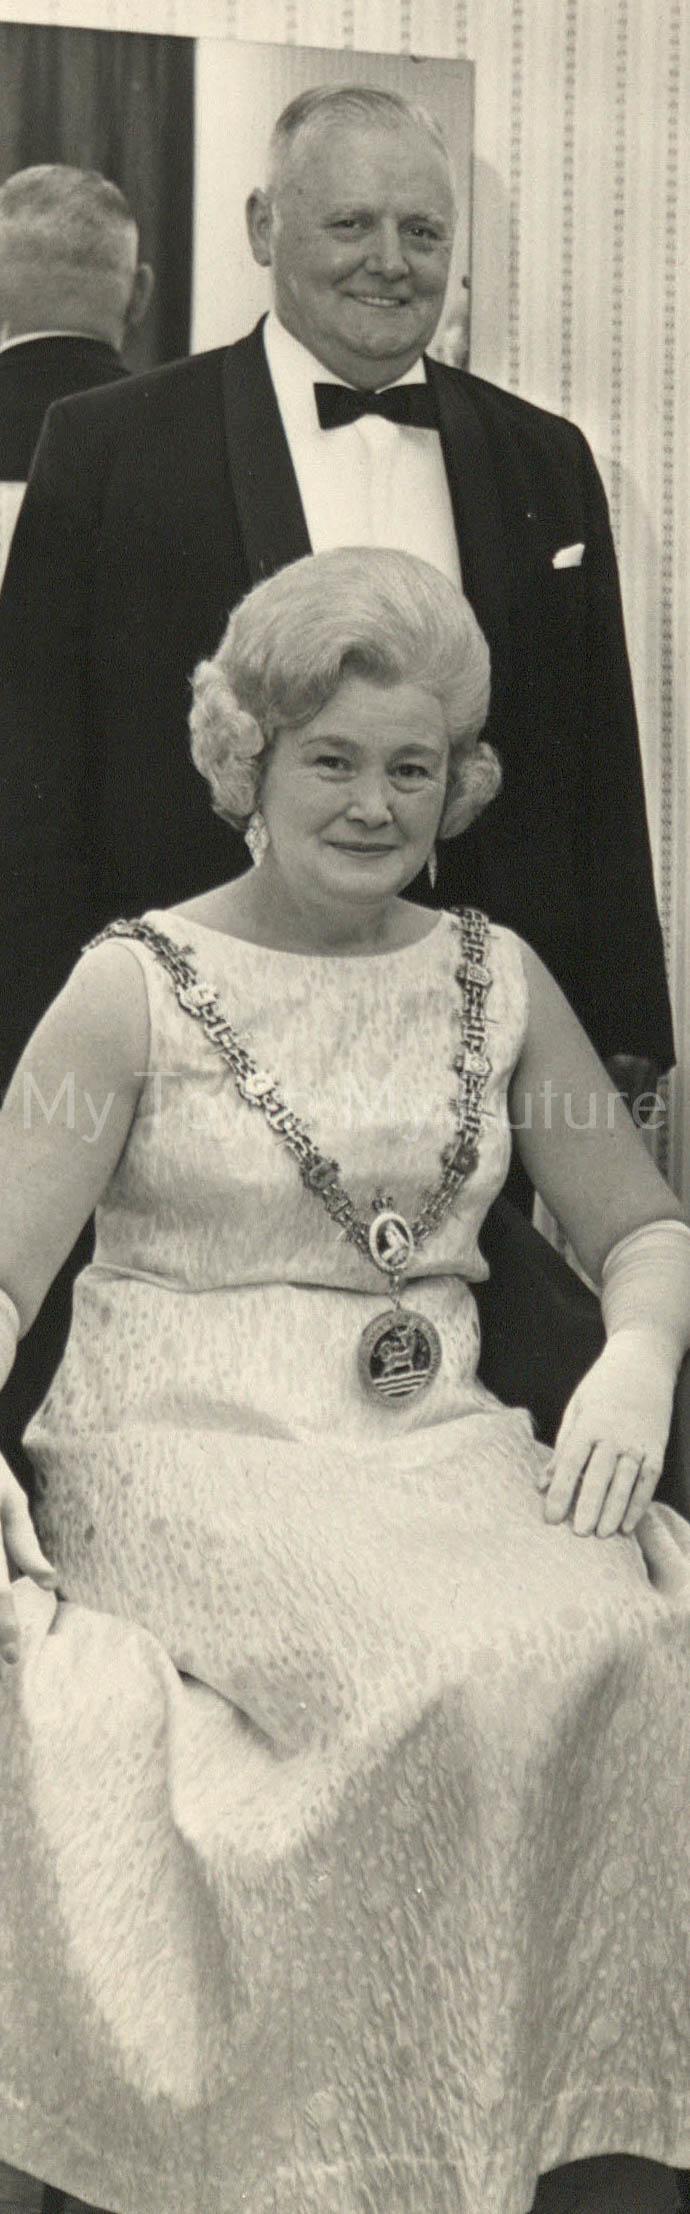 Ald. Mrs W. J. Tuson